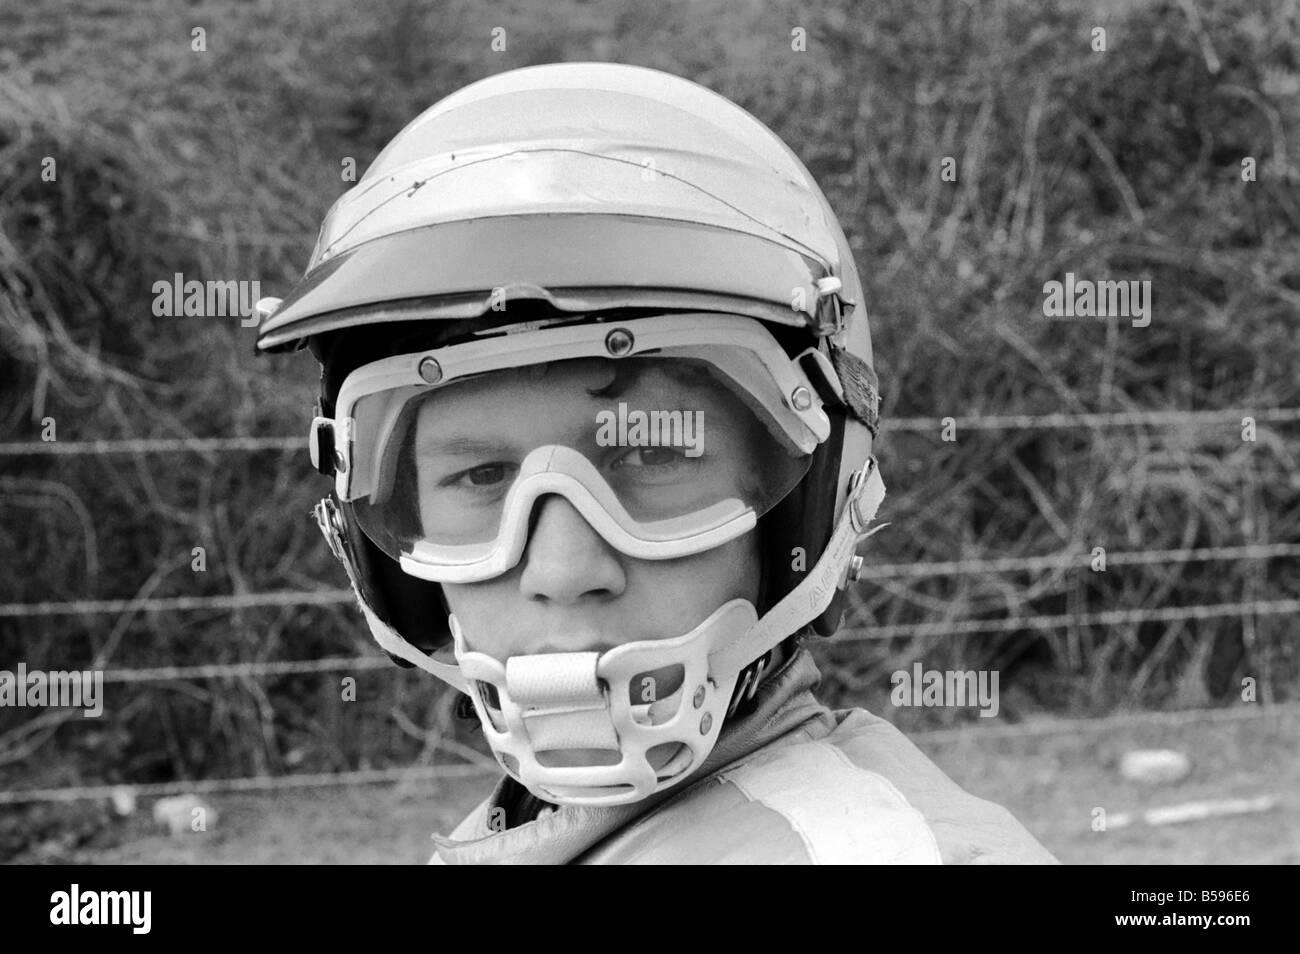 Motorsport/Children/Motorbike: Schoolboys Scramble. March 1975 75-01212-023 - Stock Image